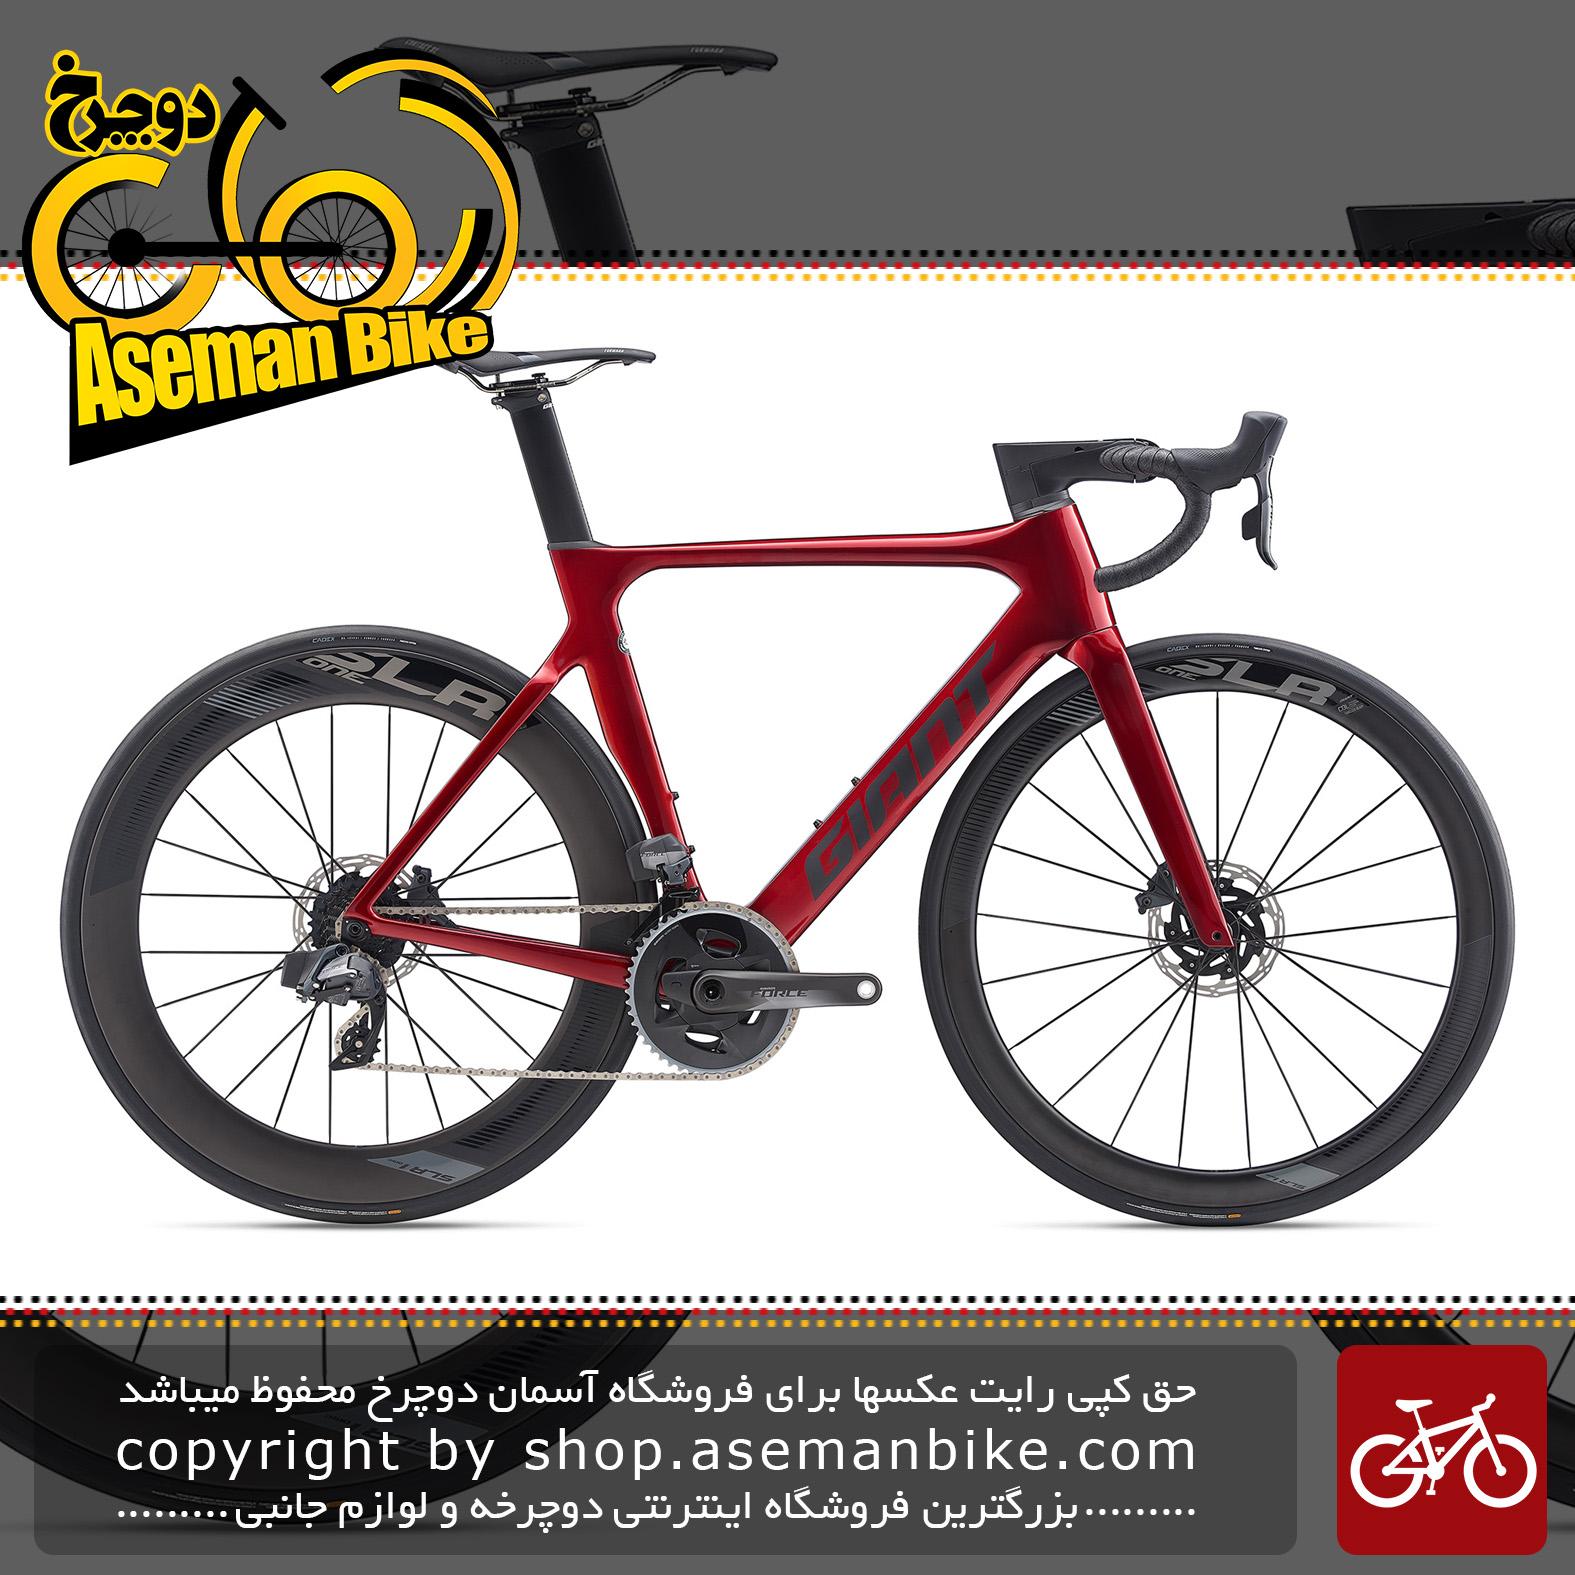 دوچرخه کورسی جاده جاینت مدل پروپل ادونس پرو 0 دیسک هیدرولیک 2020 Giant Road Bicycle Propel Advanced Pro 0 Disc Red 2020